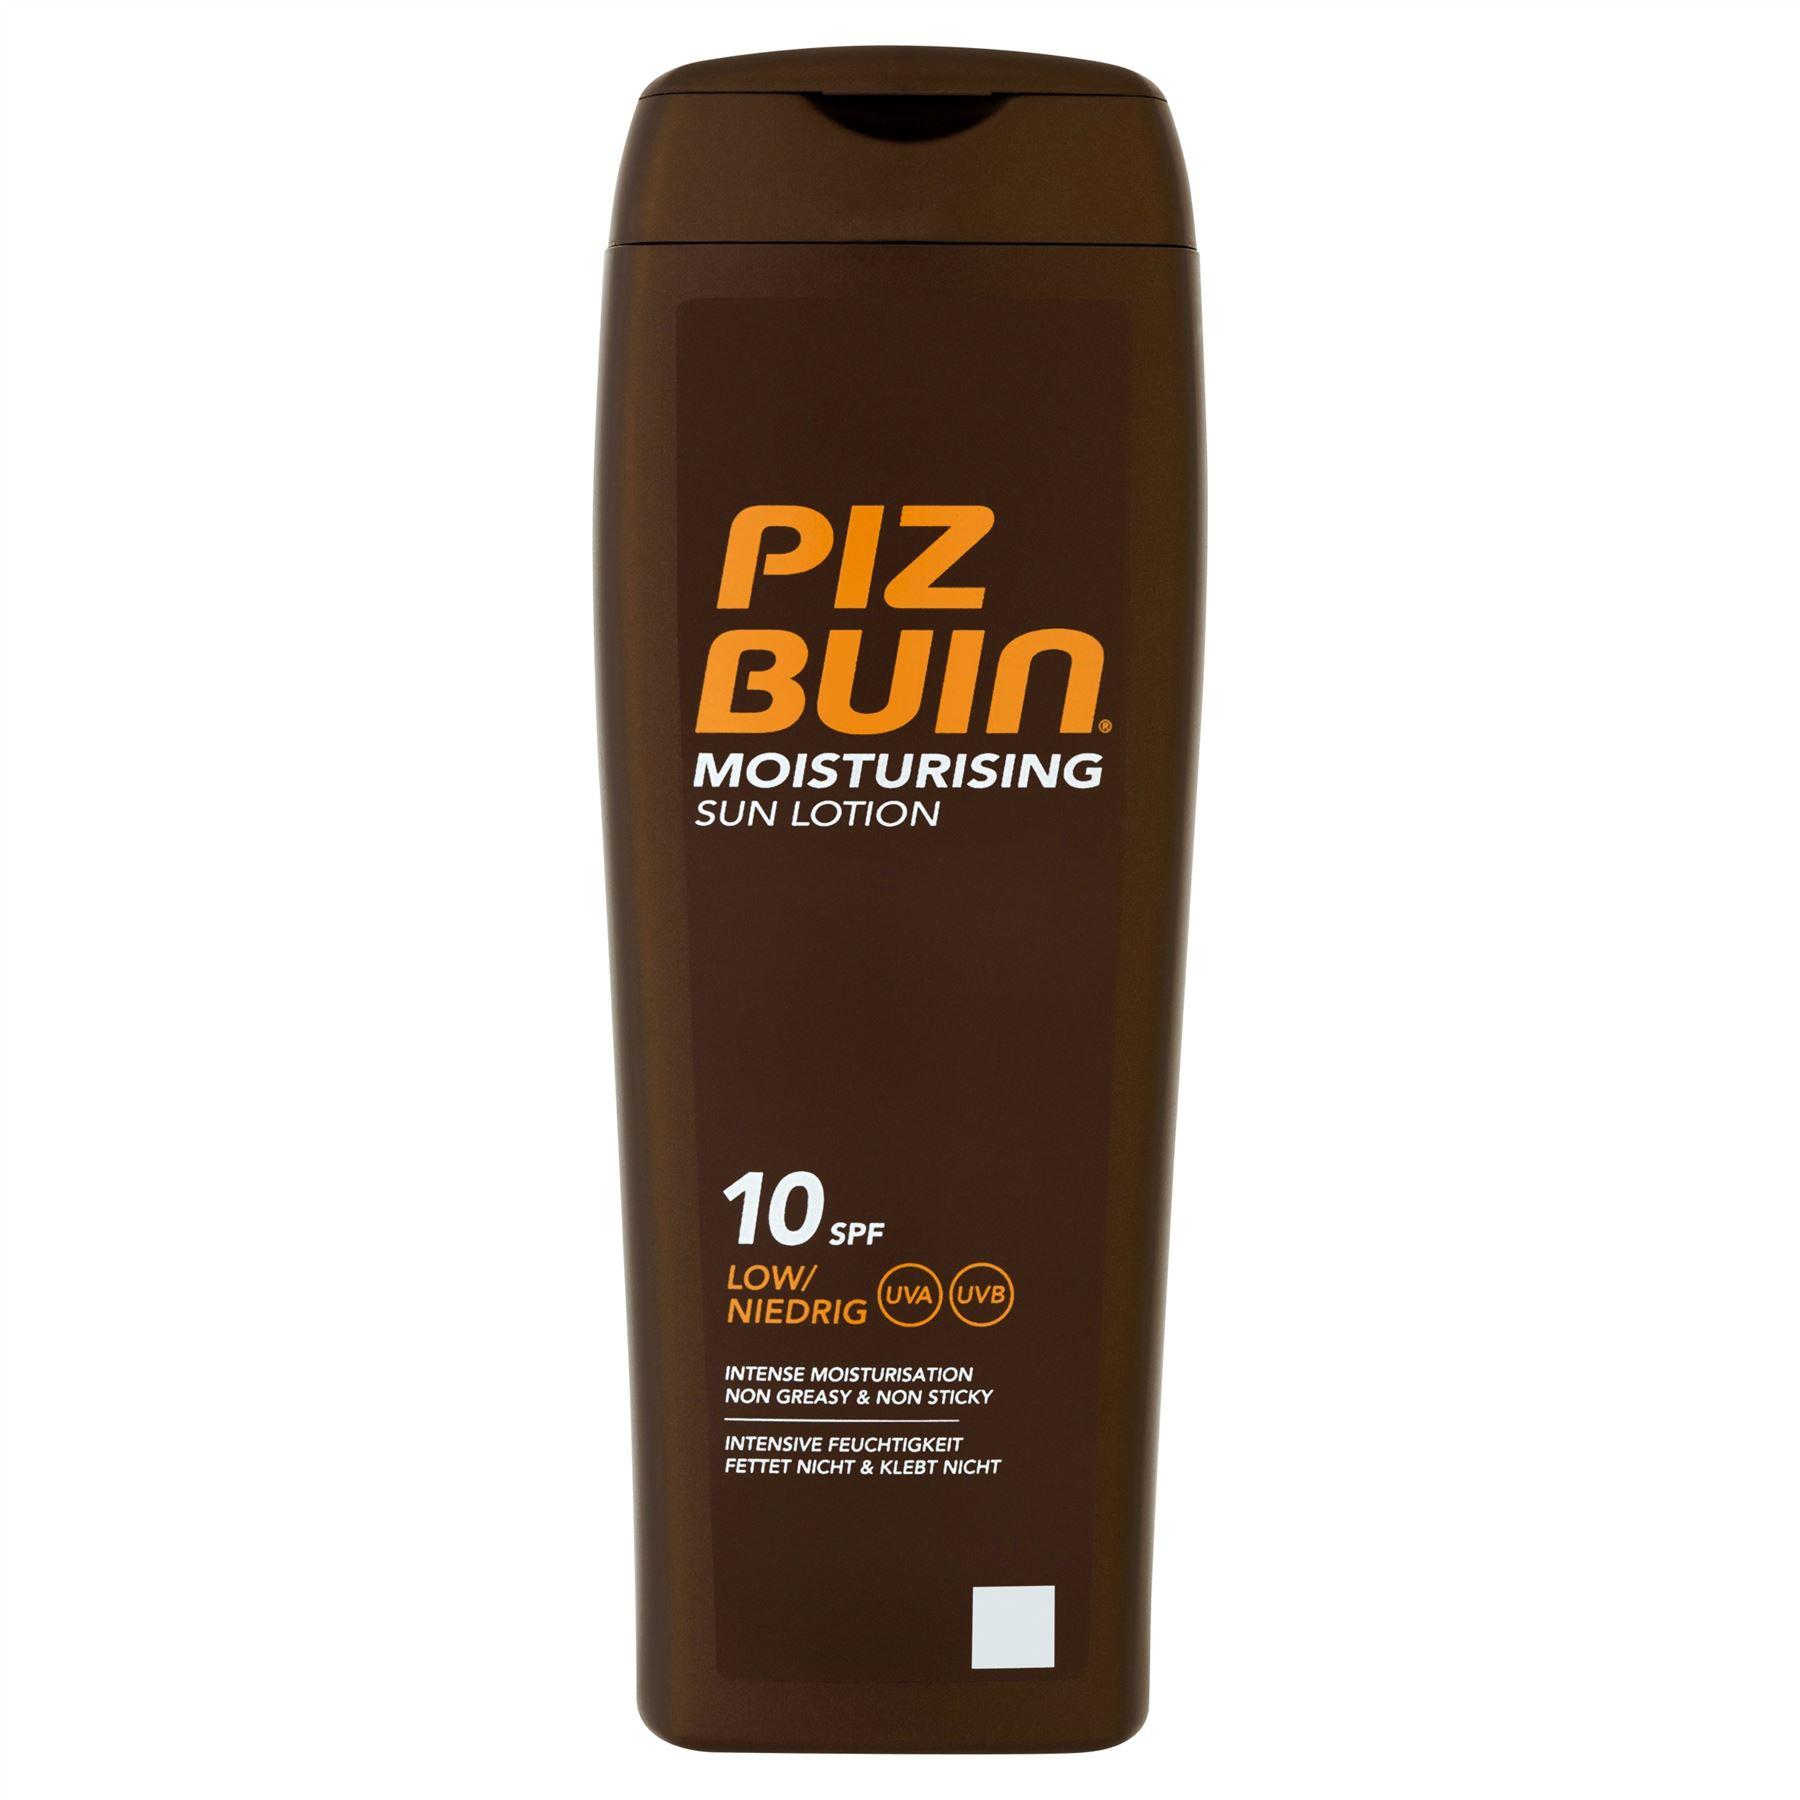 Piz Buin Moisturising Sun Lotion SPF 10 Low 200ml | eBay